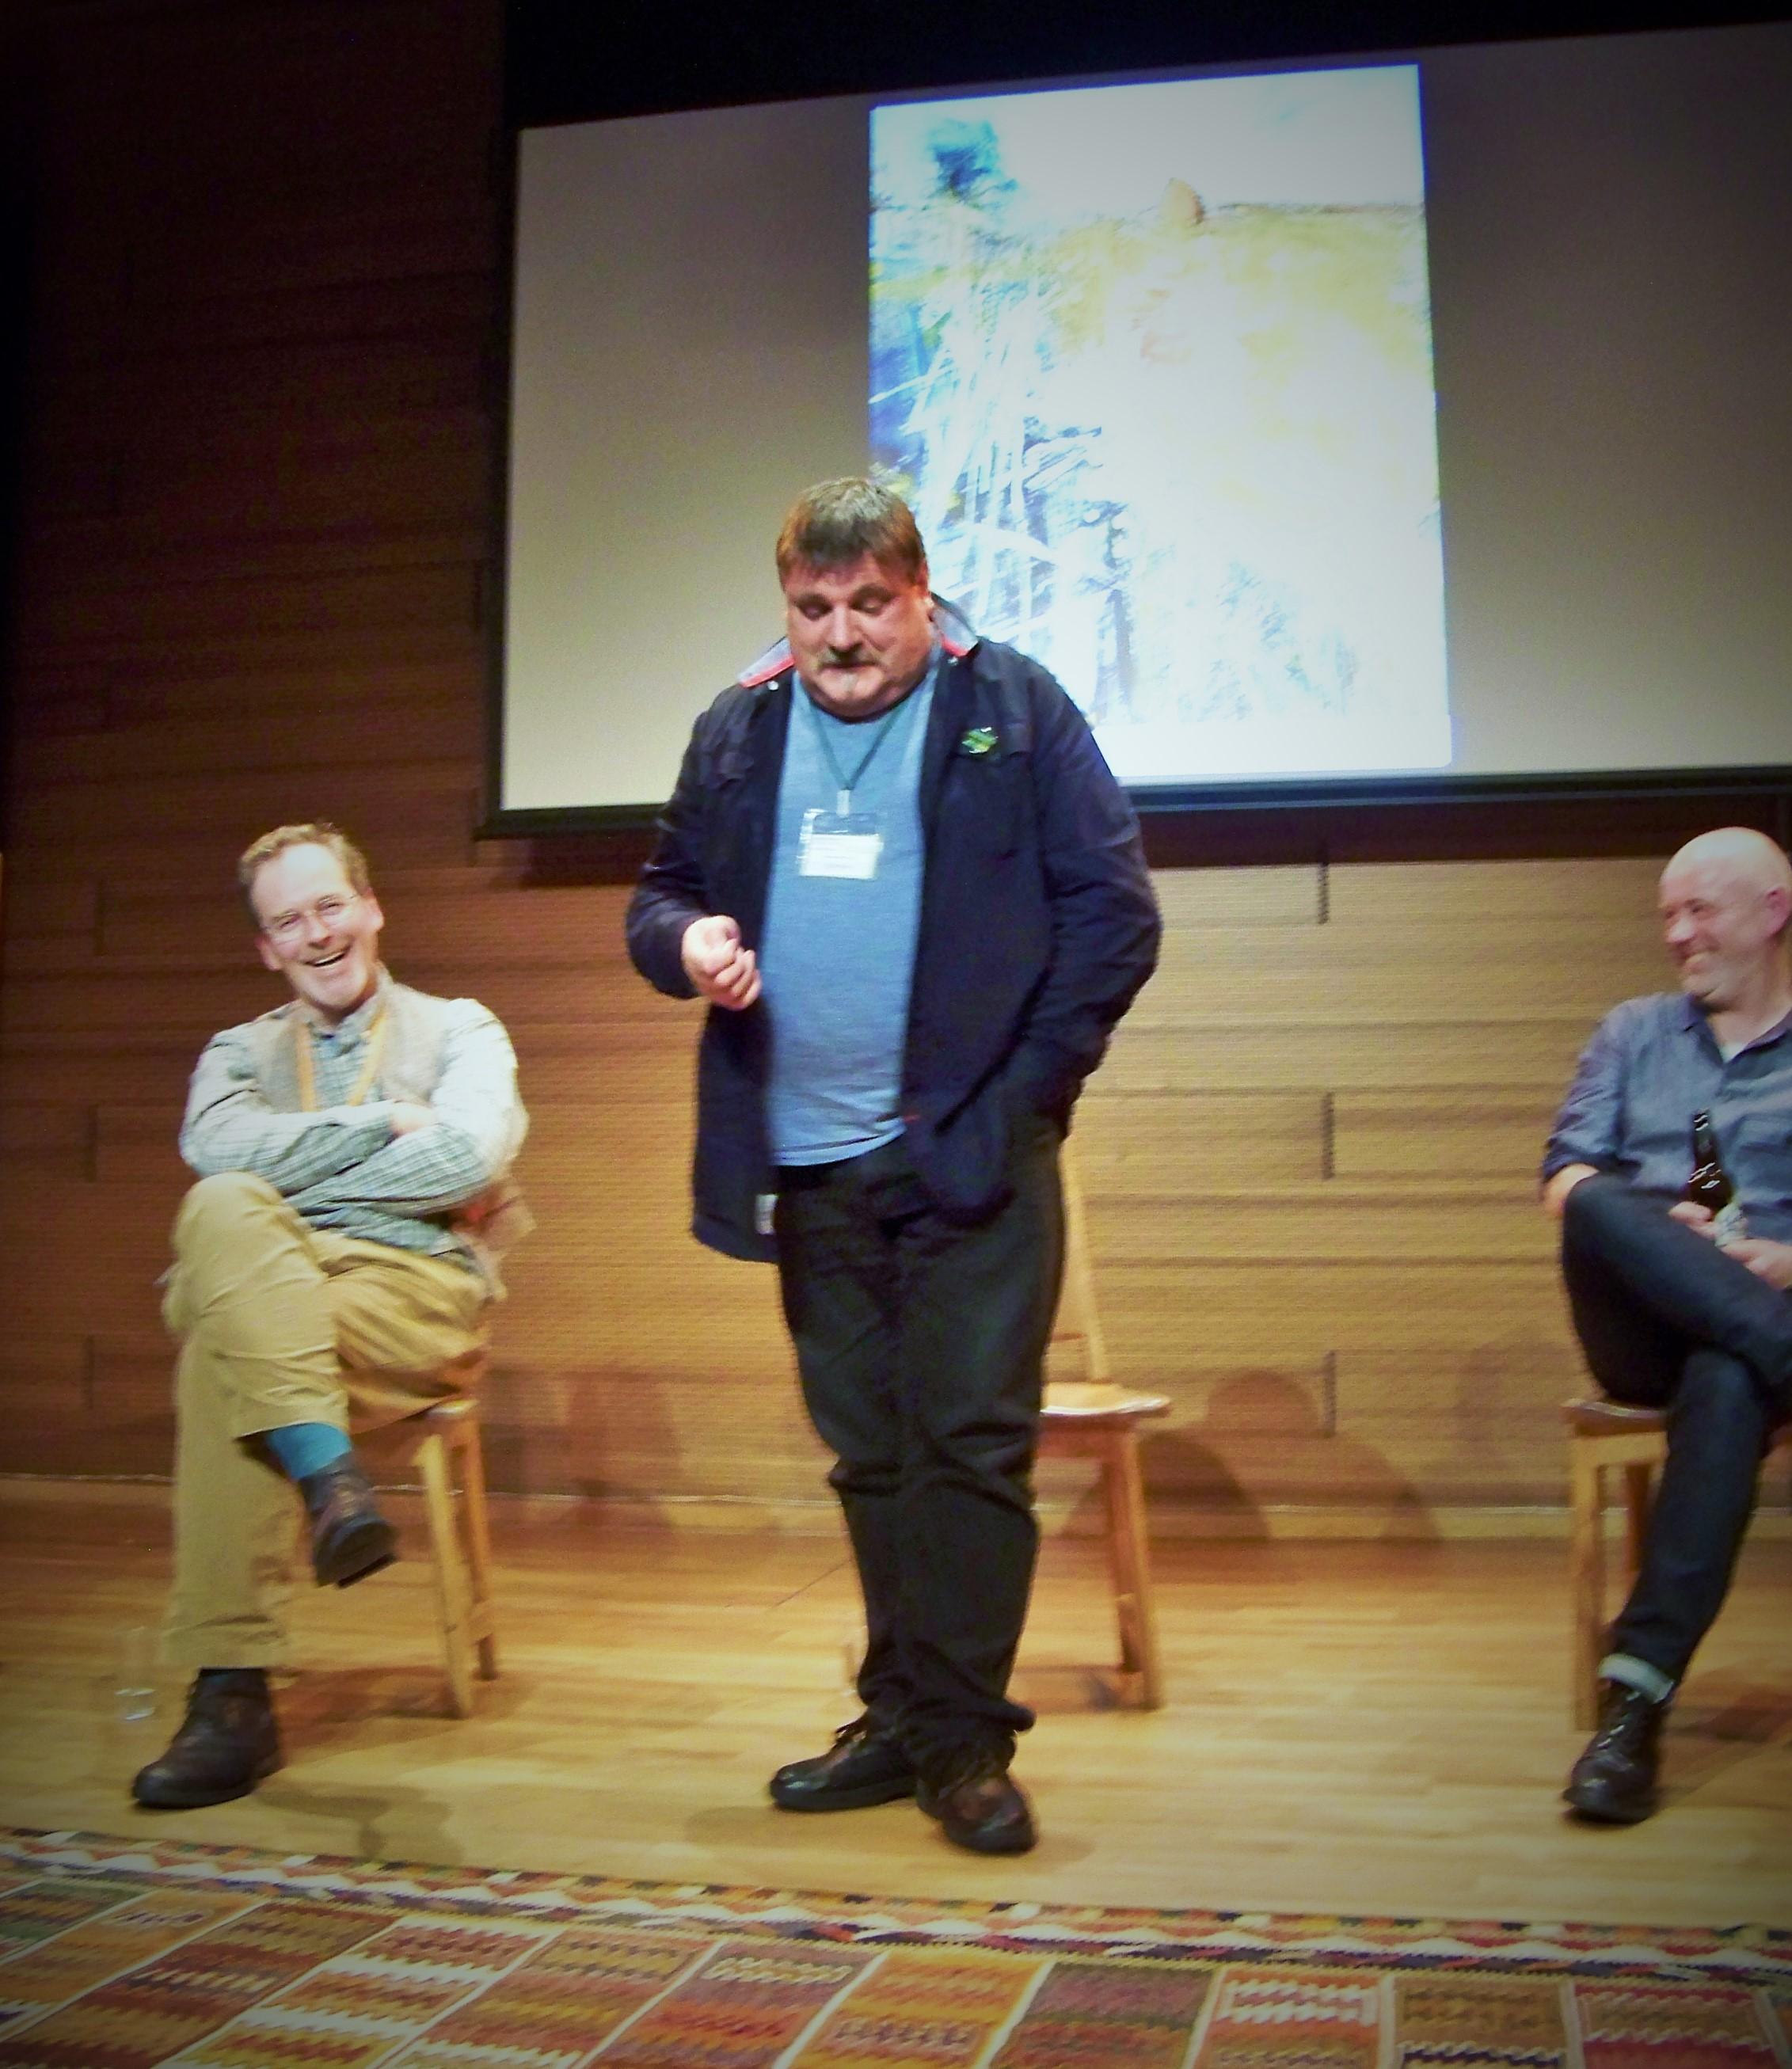 Traditional Scottish storyteller, Tom Muir, native of Orkney, telling stories at the Edinburgh Storytelling Festival. Keeping Scotland's stories alive